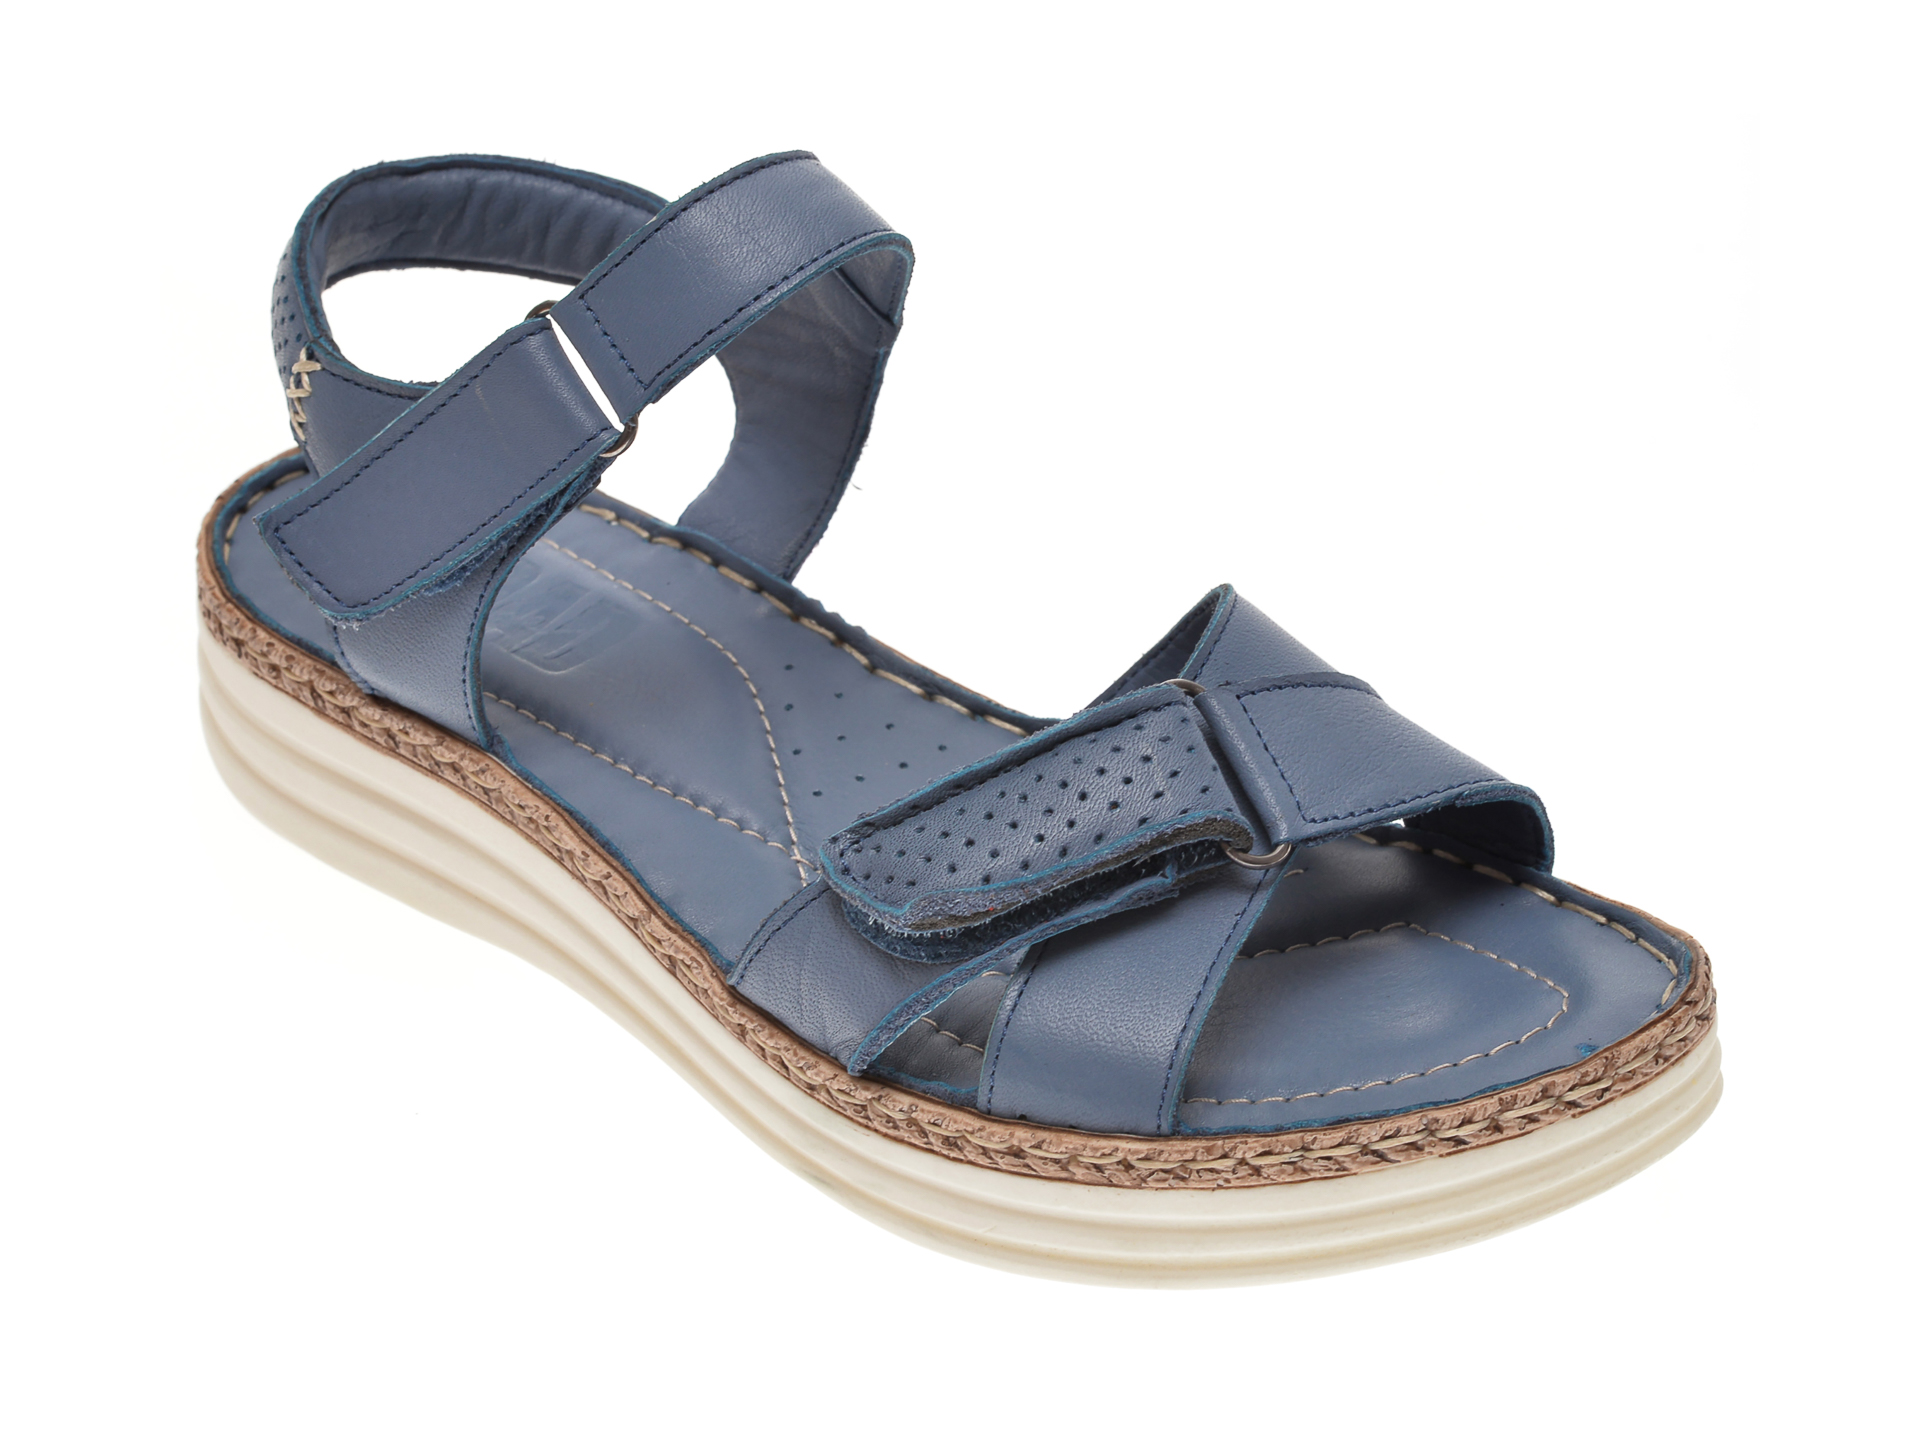 Sandale ON THE ROAD albastre, 502, din piele naturala